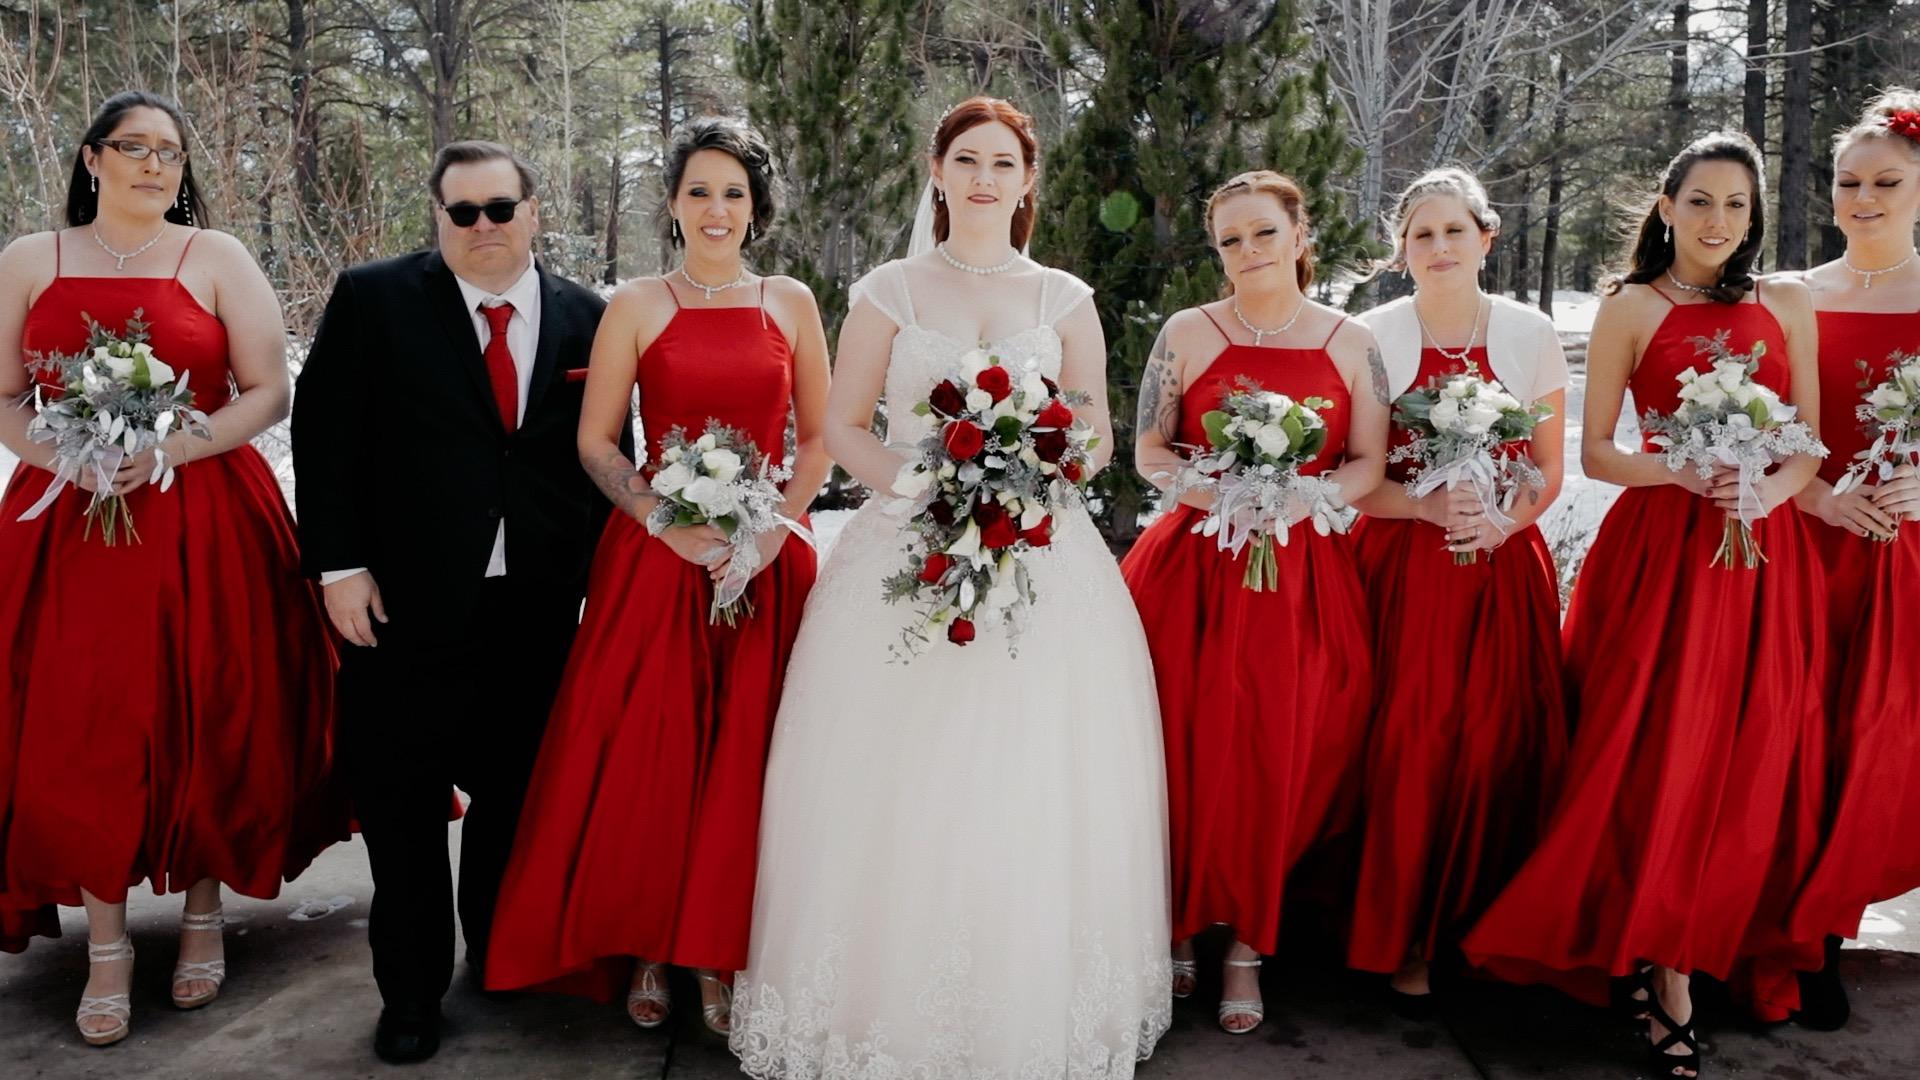 Flagstaff wedding